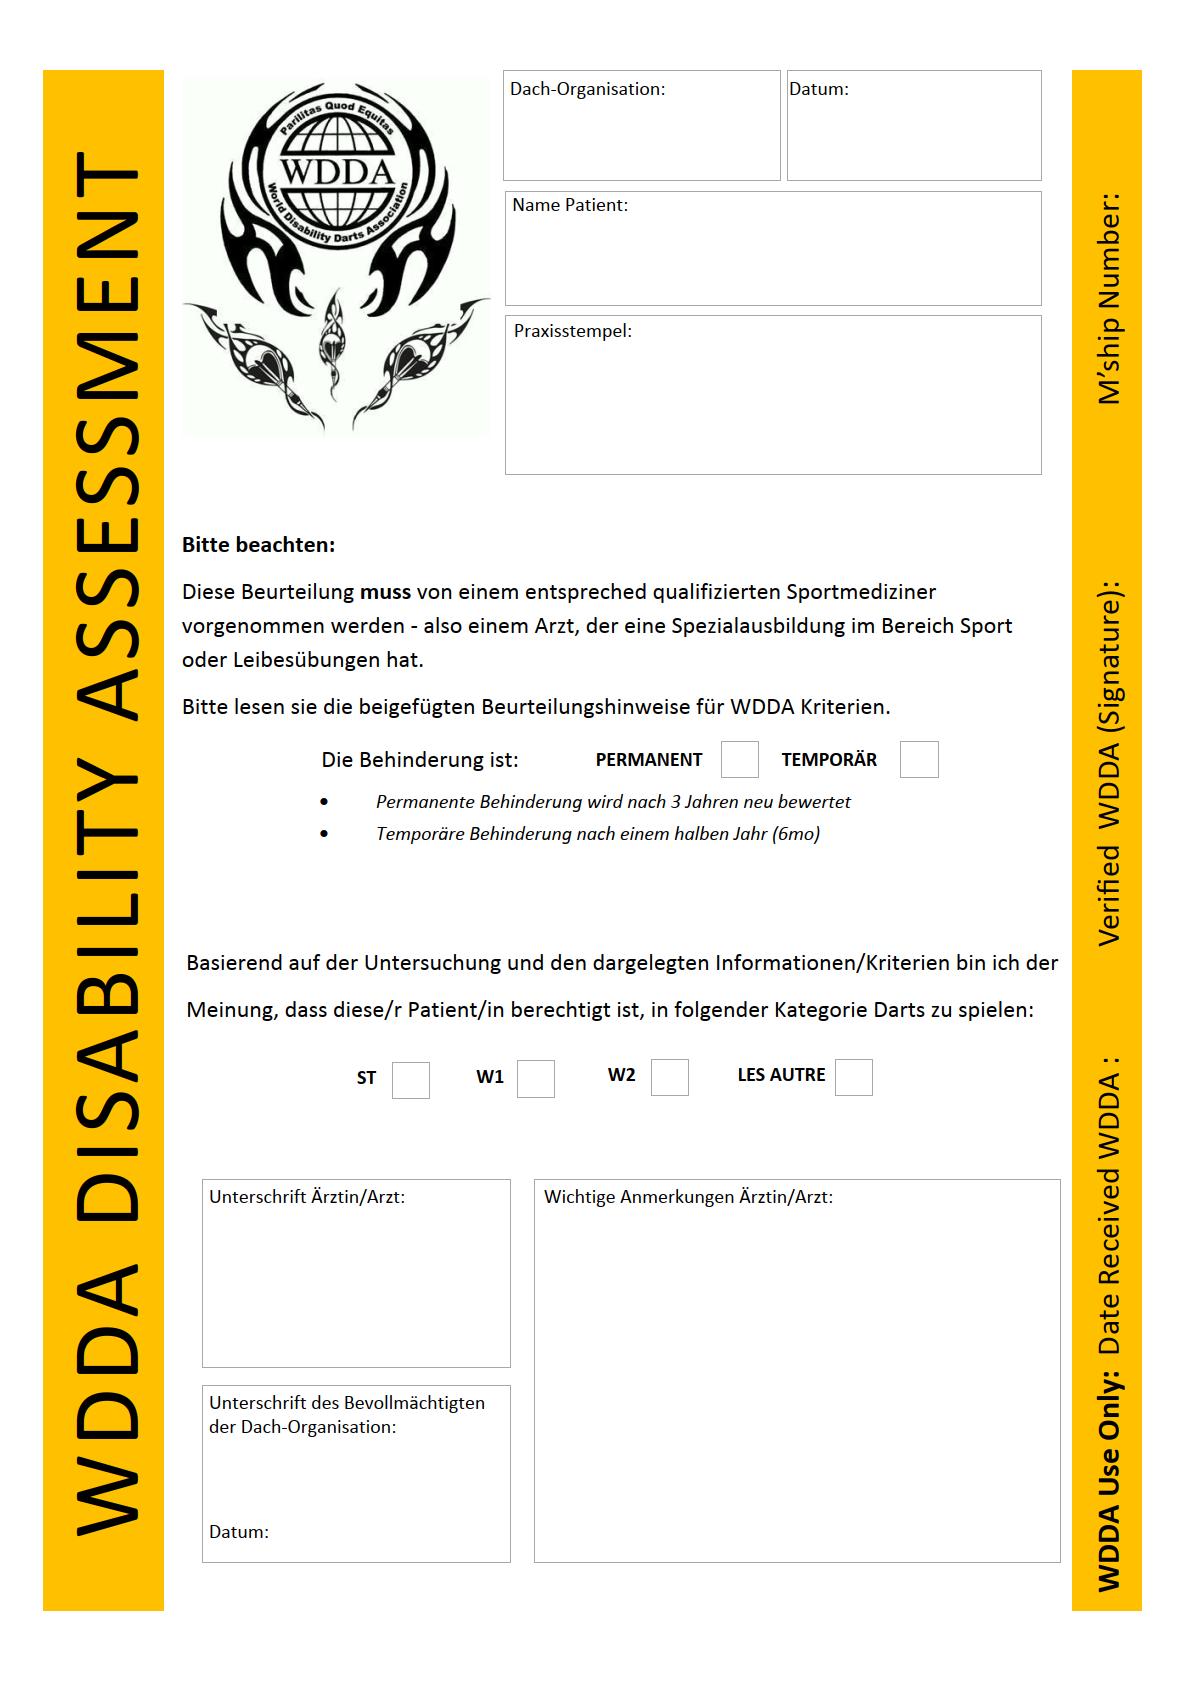 WDDA darts formular seite 1